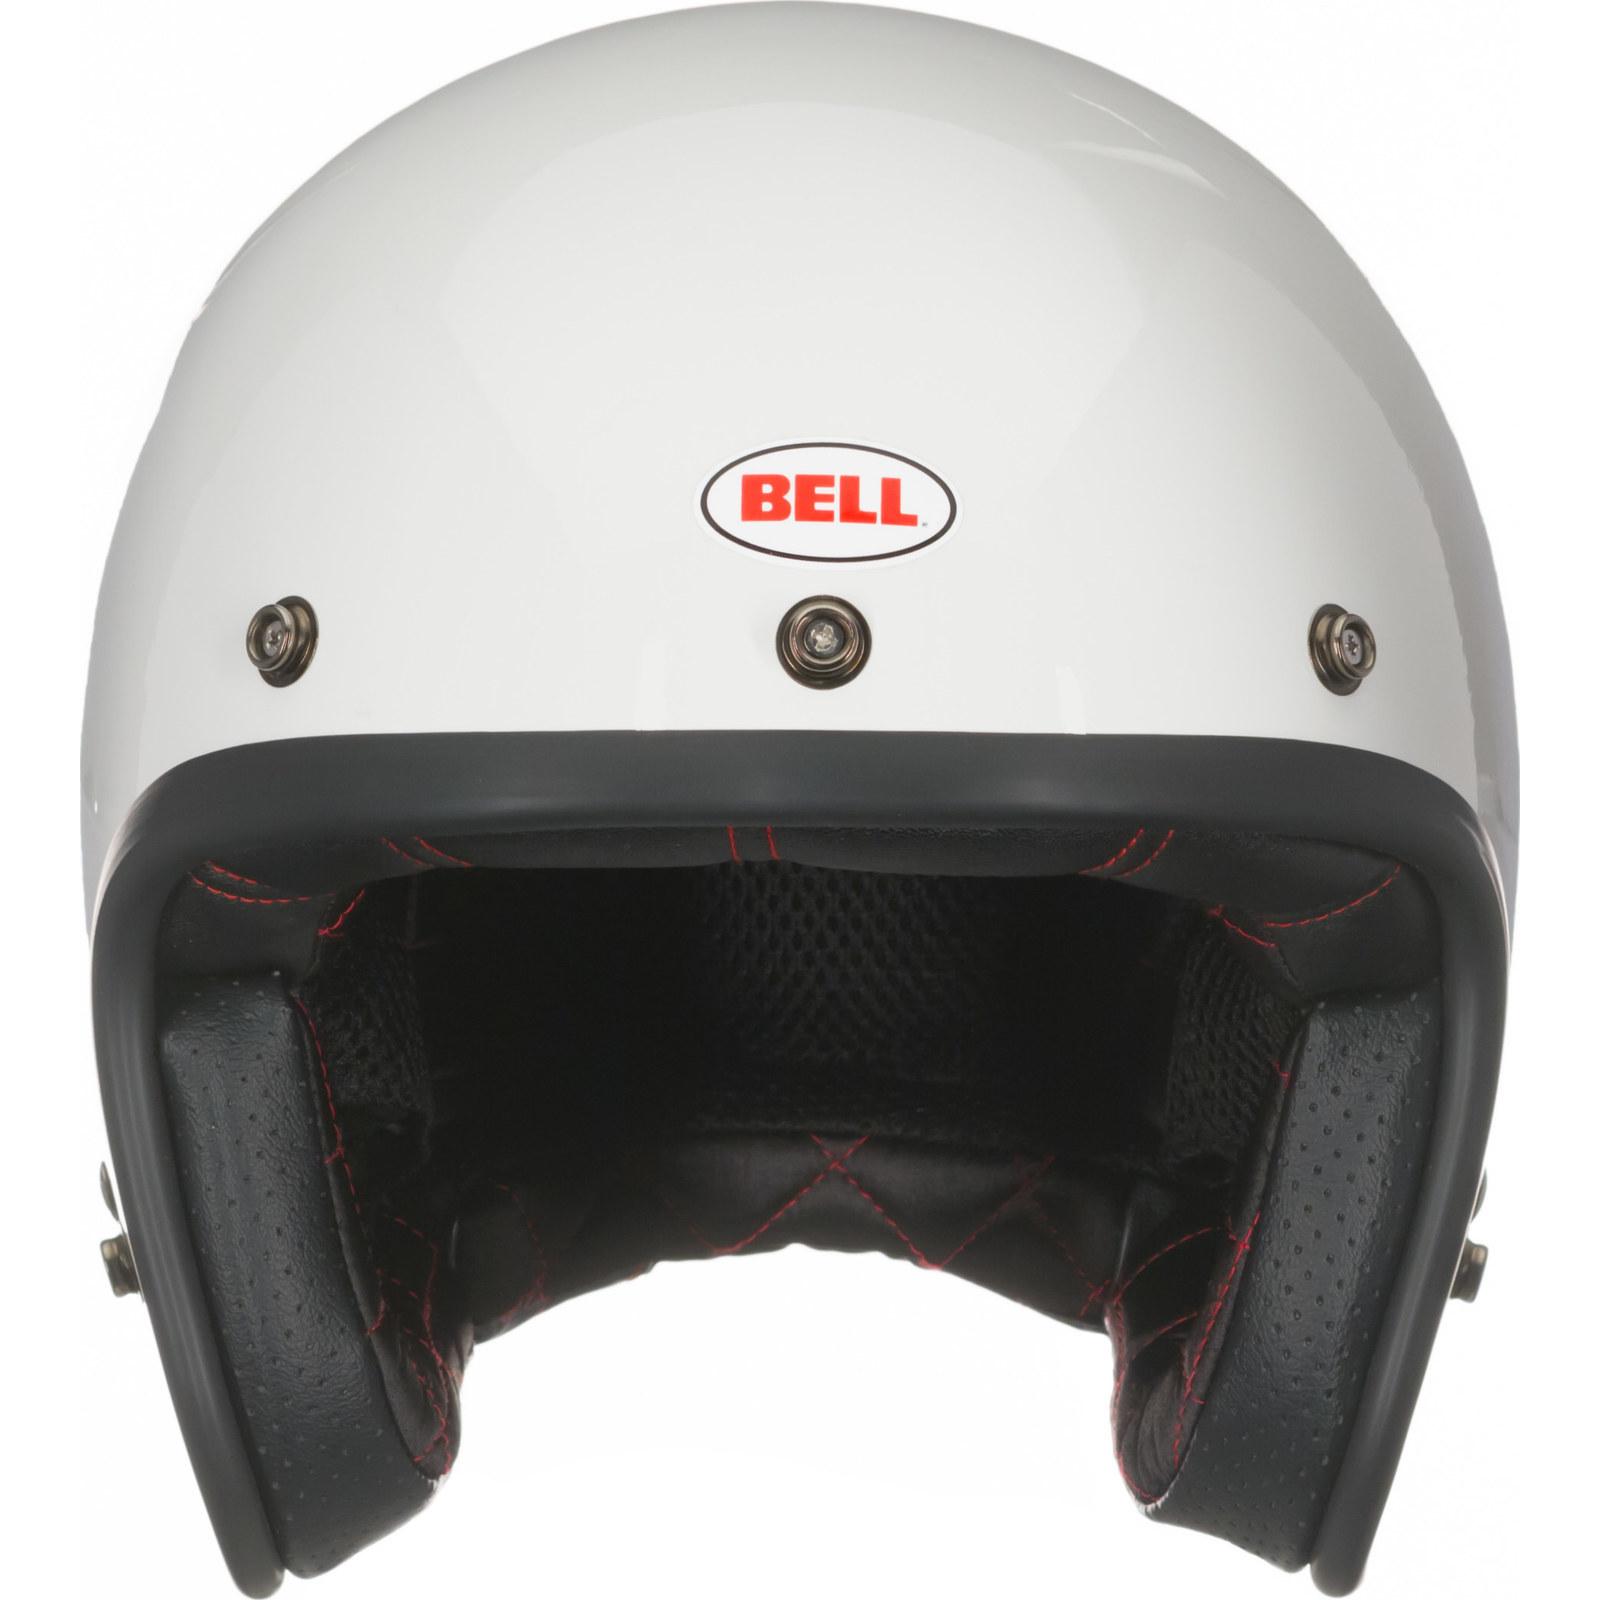 Bell Retro Motorcycle Helmets